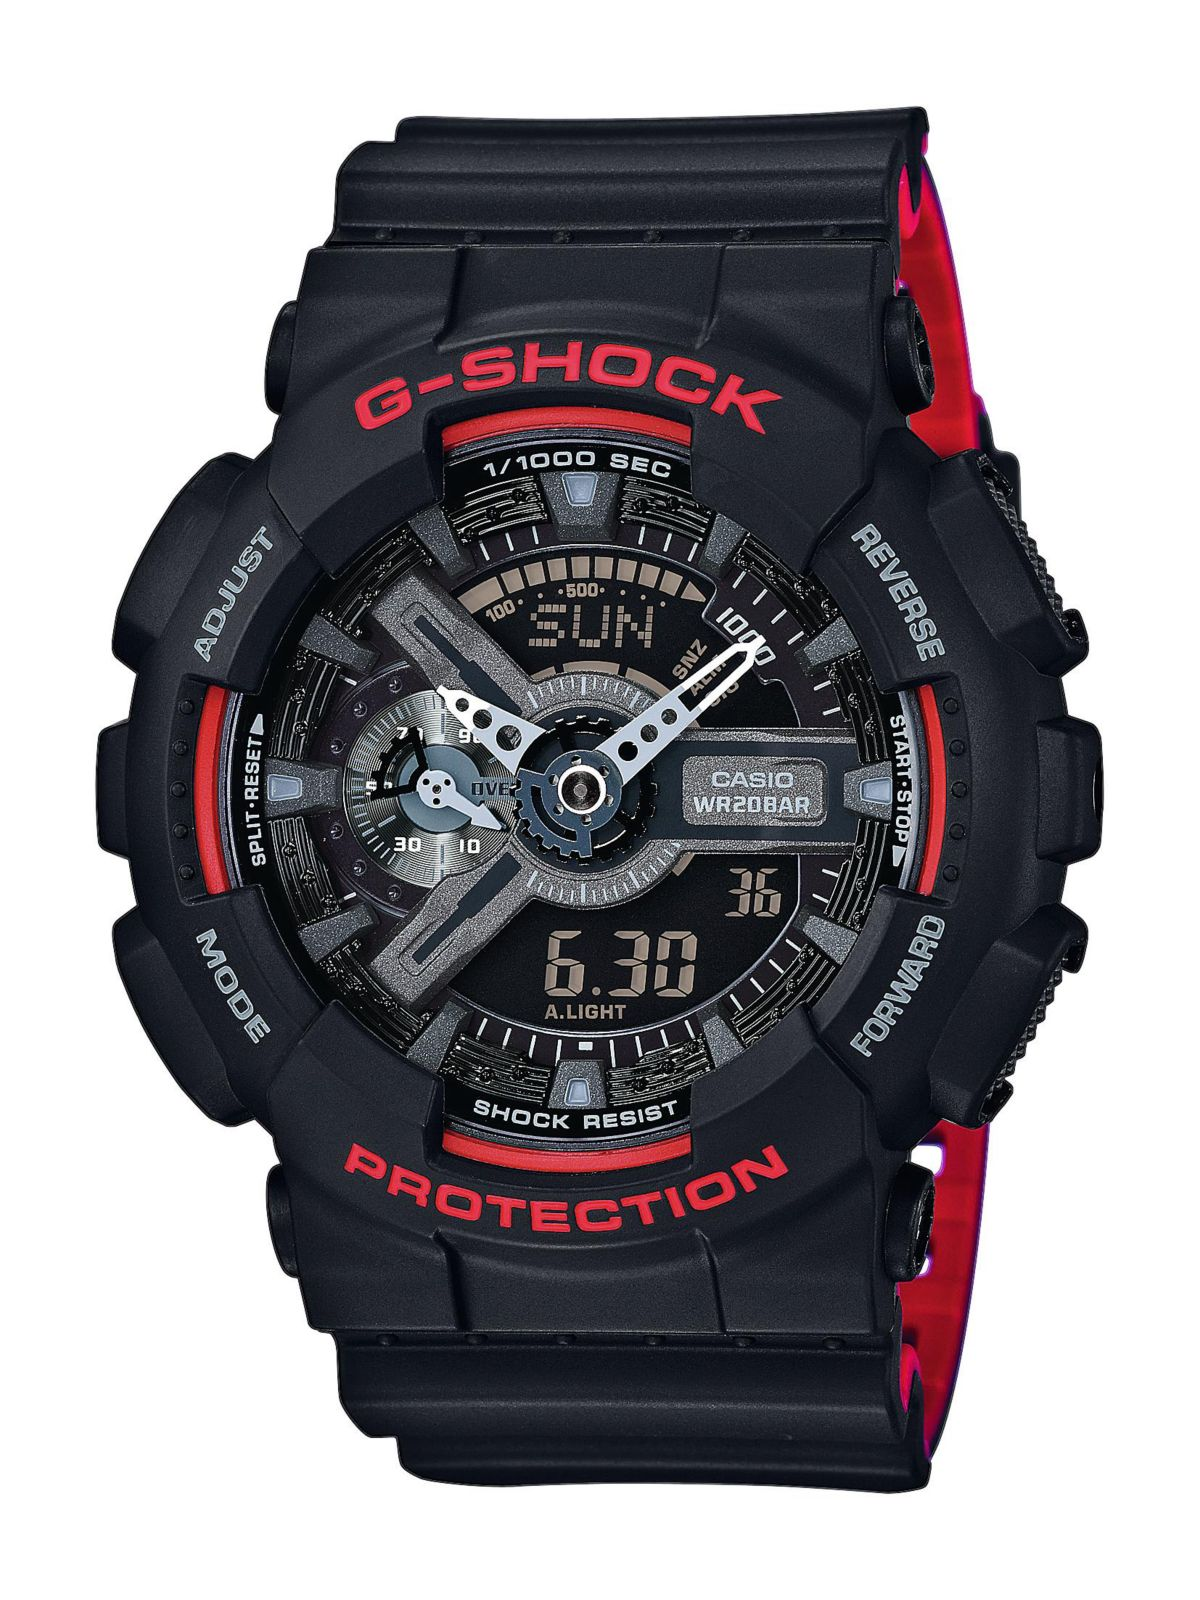 Casio G-Shock Chronograph  GA-110HR-1AER  Preisvergleich